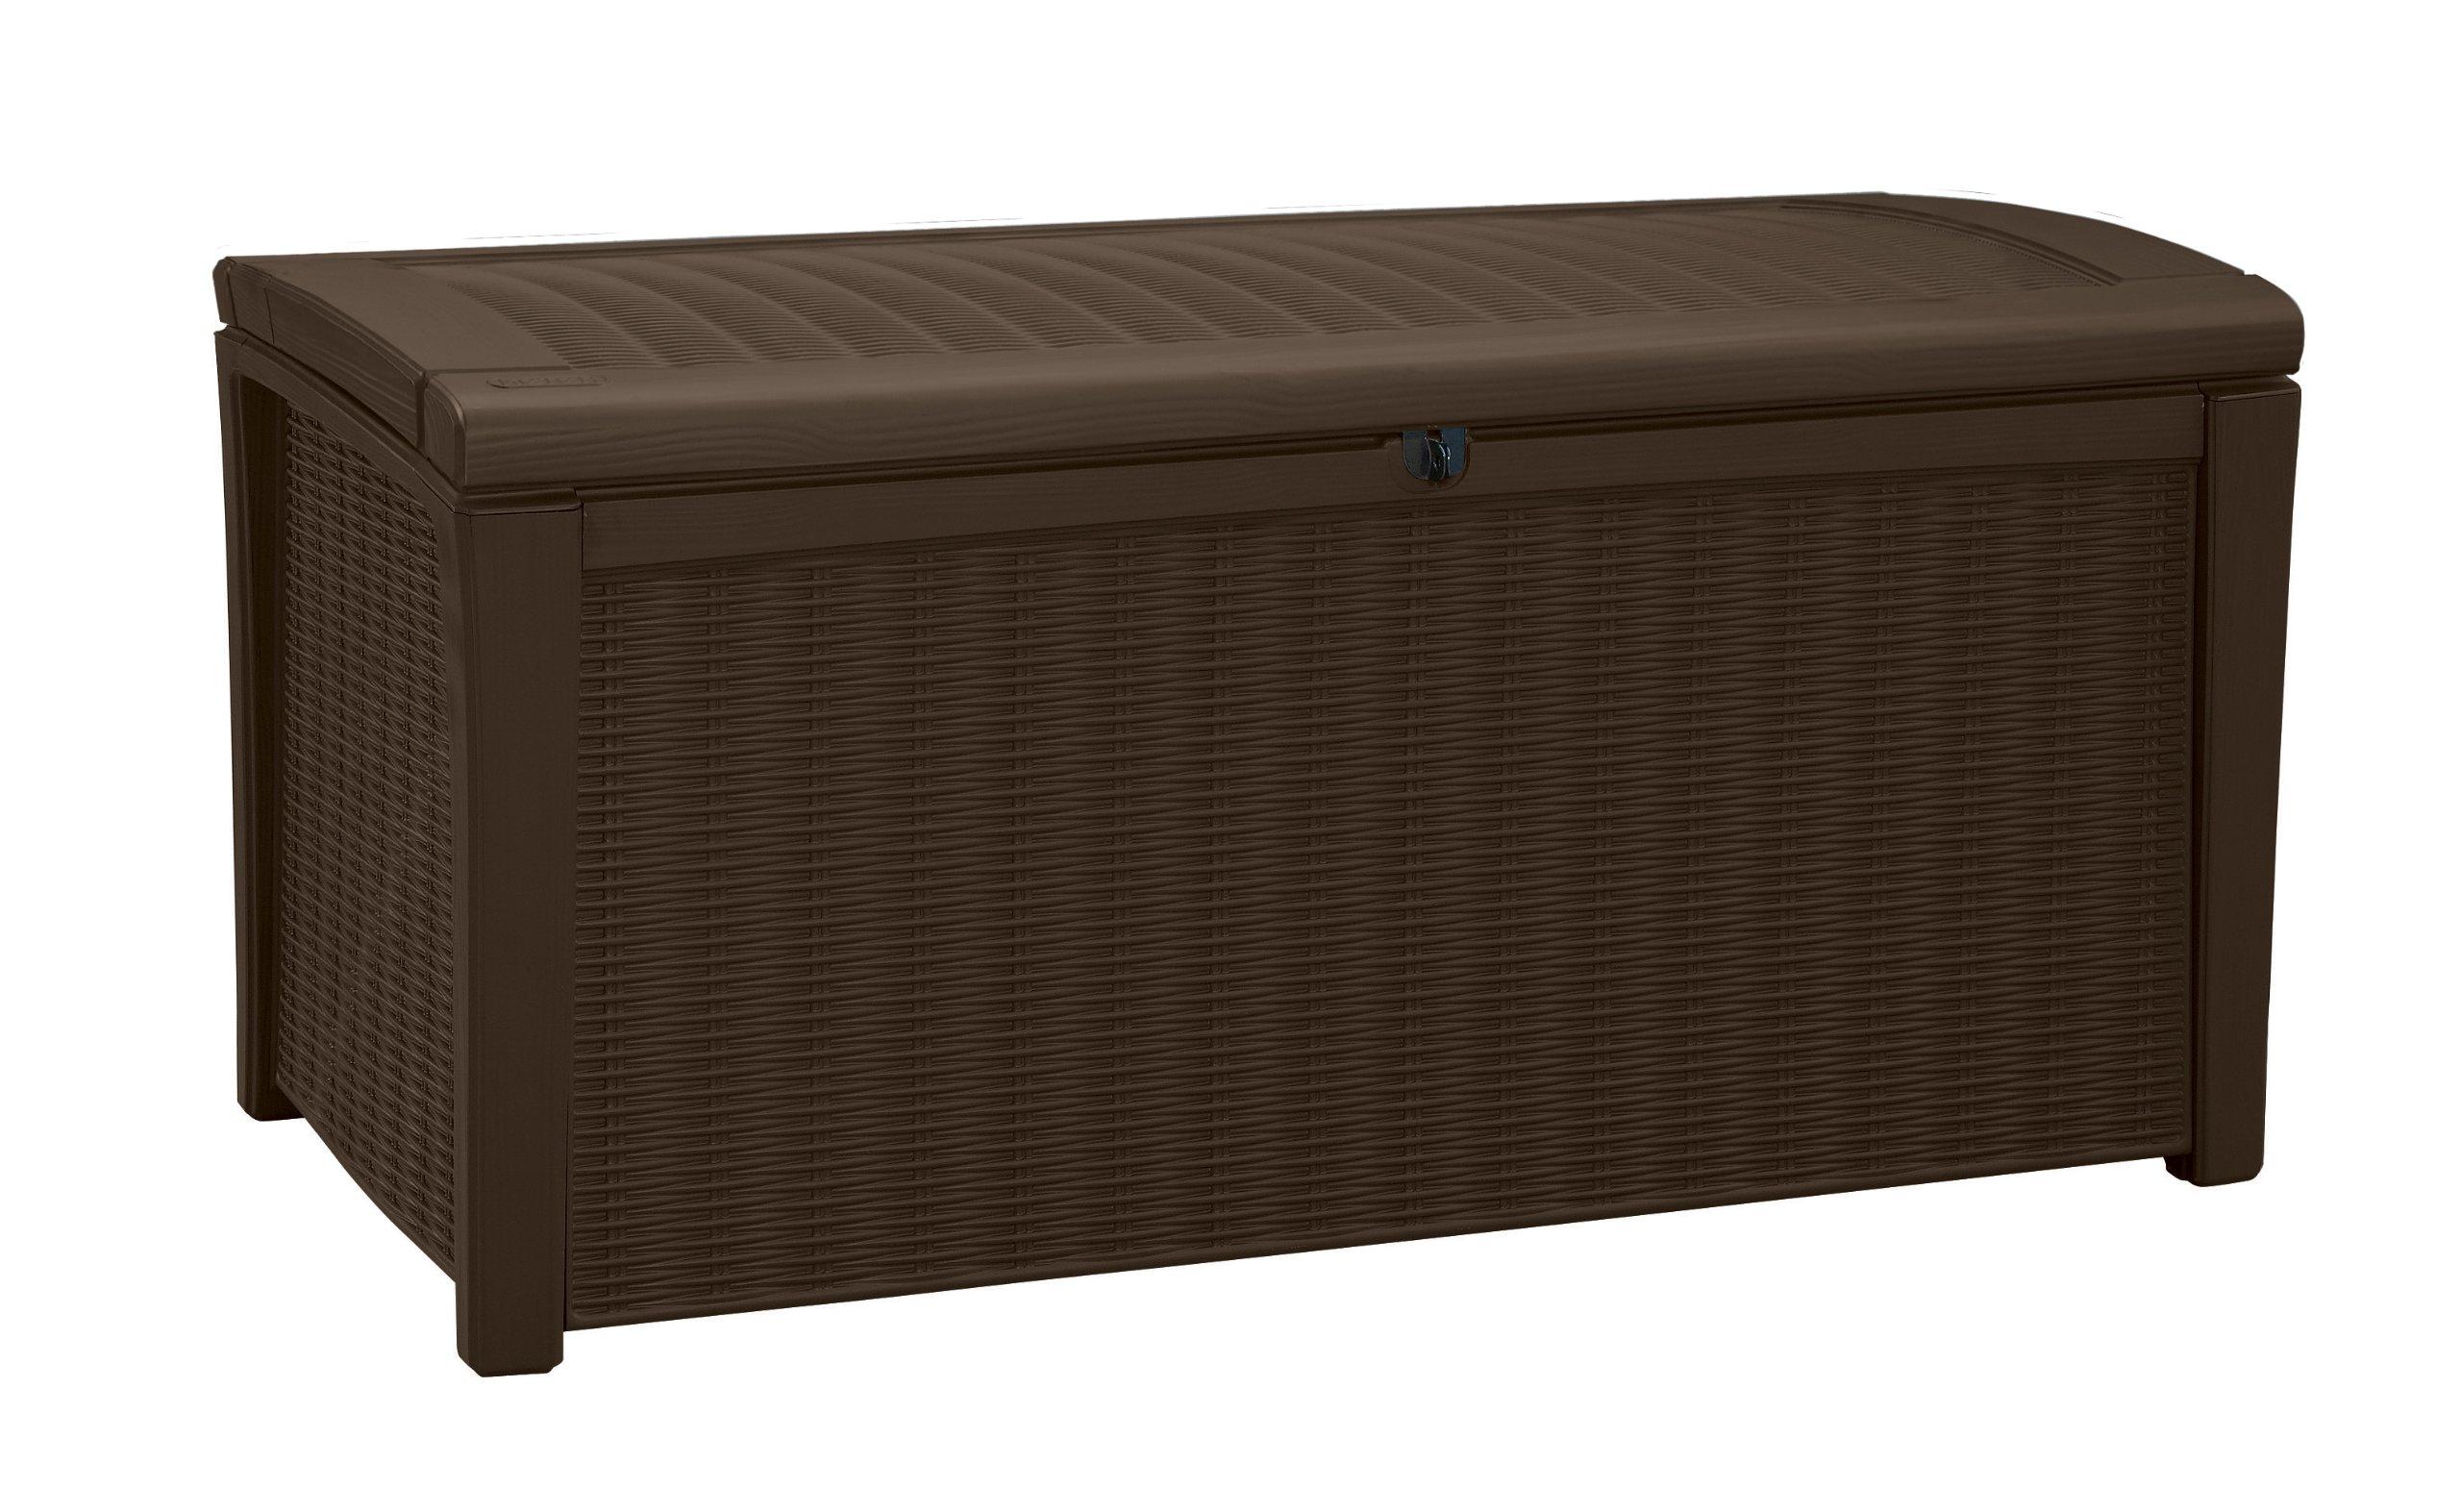 Keter 211359 Borneo 110 Gal. Plastic Outdoor Patio Storage Container Deck Box & Gar, Brown by Keter